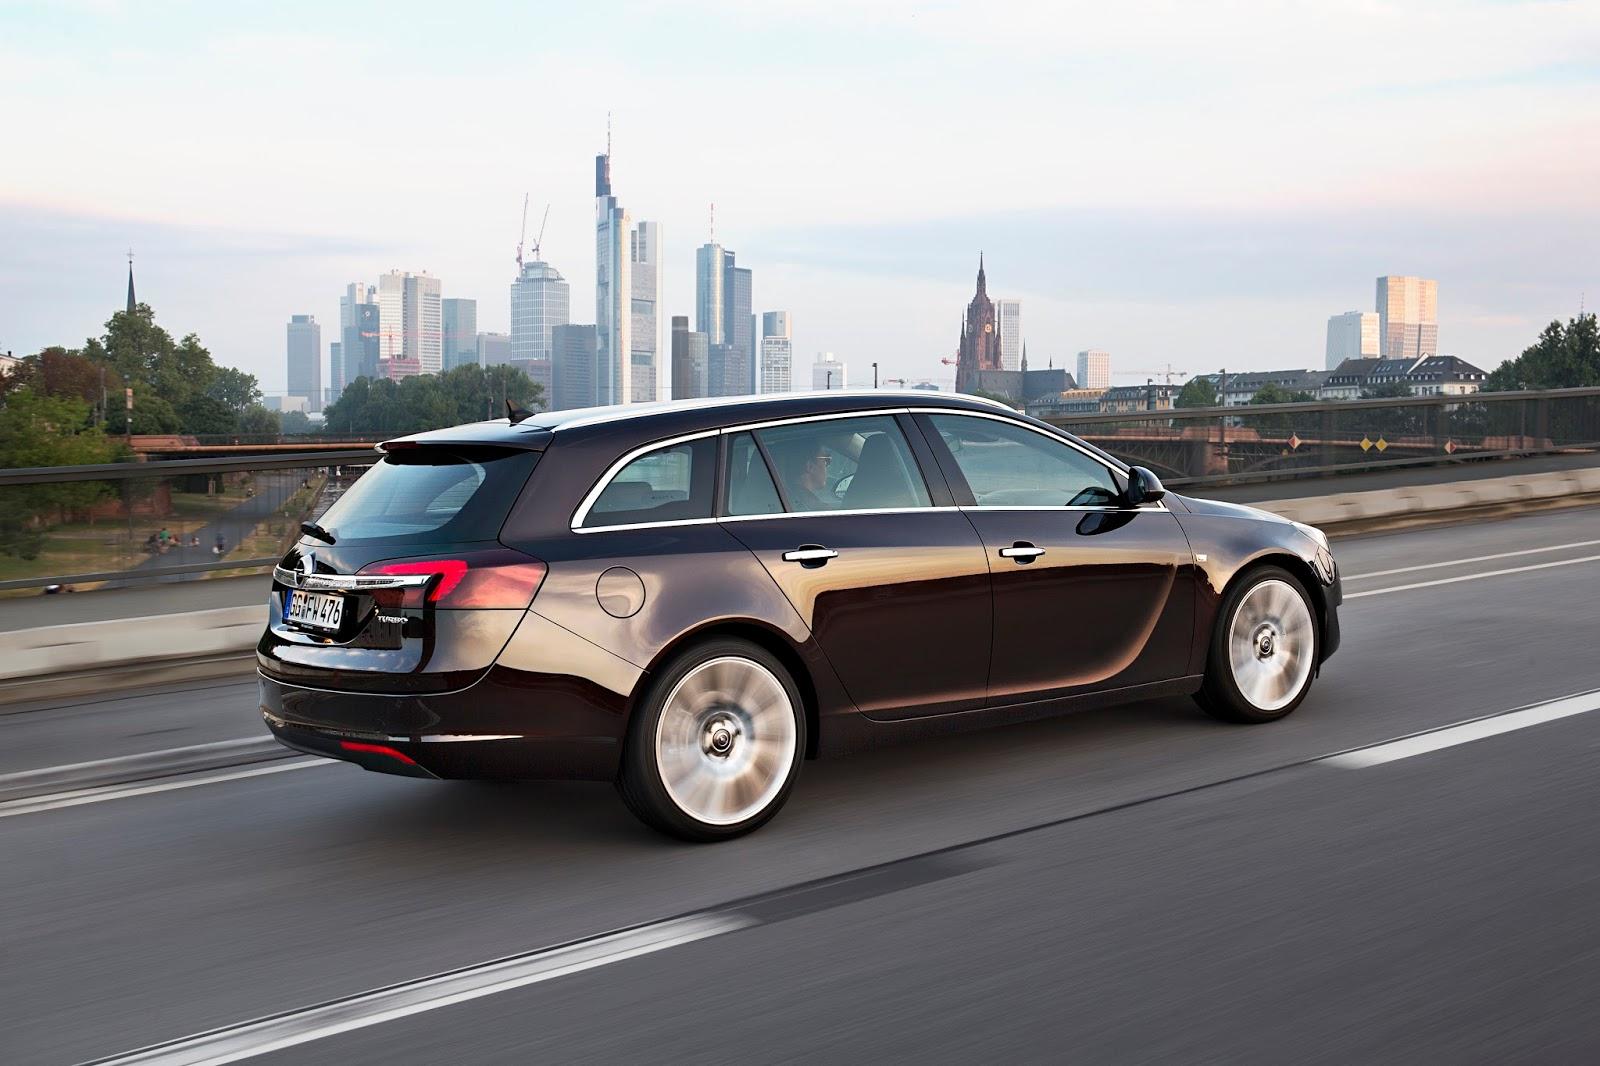 Opel Insignia Sports Tourer 287568 Η εφαρμογή myOpel Στέλνει τον Προορισμό στο Σύστημα Πλοήγησης από Smartphone Opel, Opel OnStar, Τεχνολογία